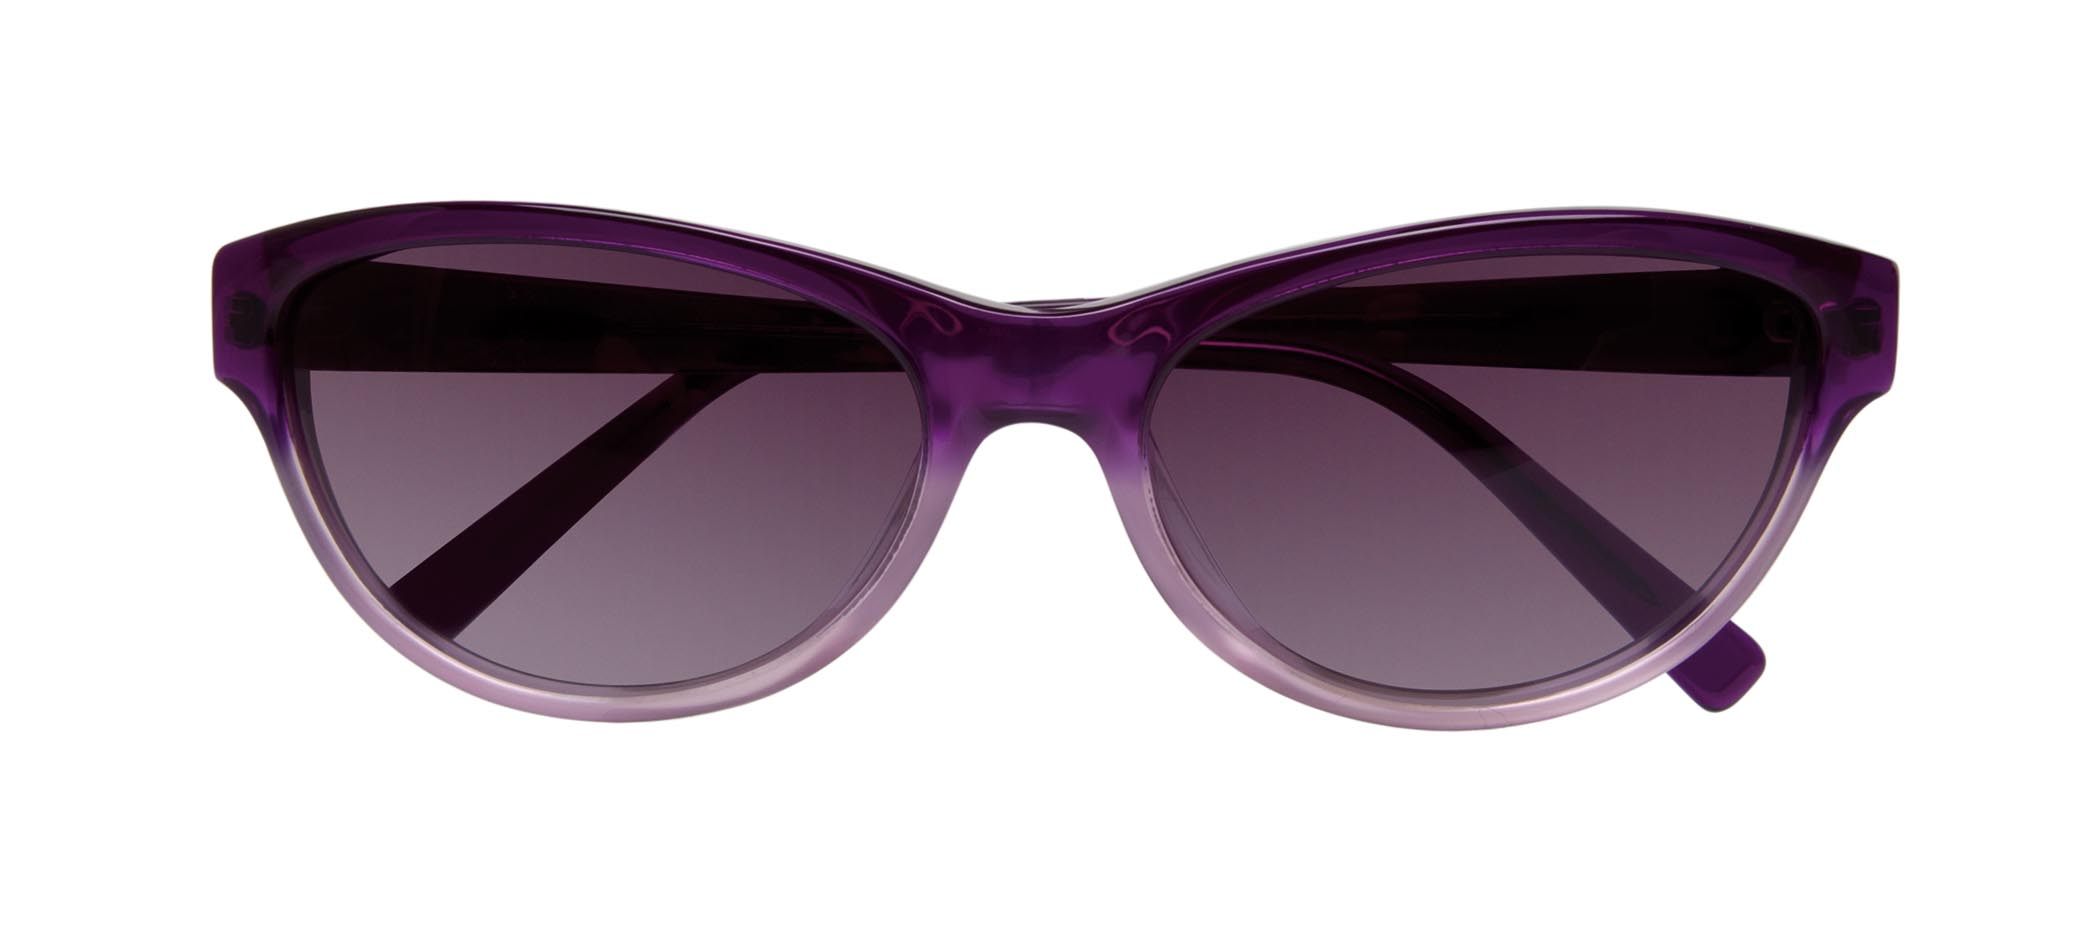 eco-Summer-Rayne-Oakes-sunglasses.jpg